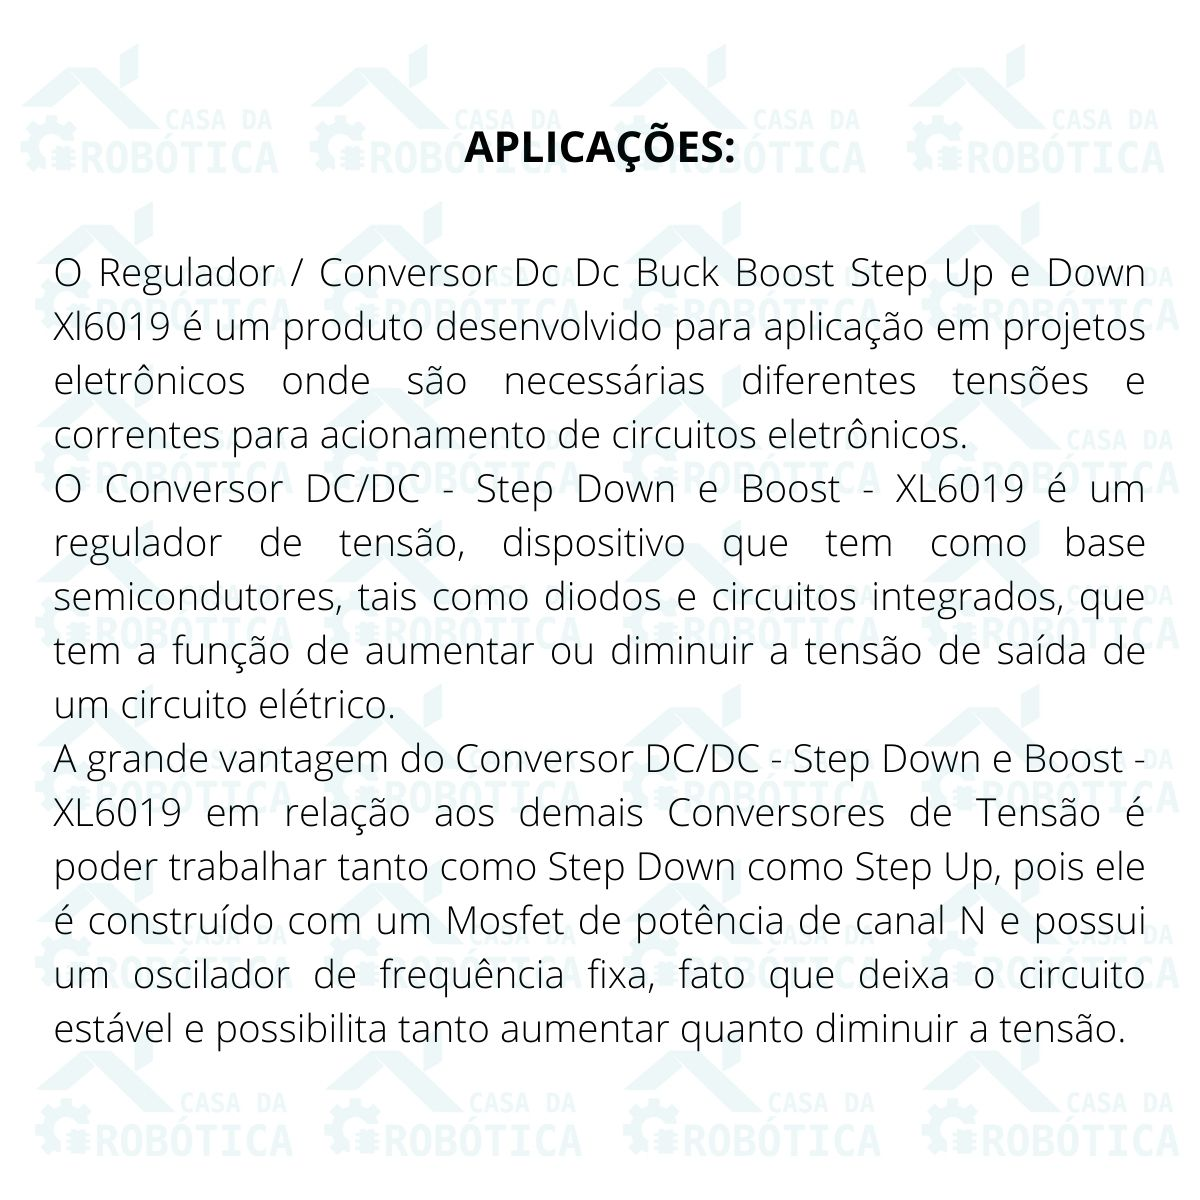 20x Conversor DC-DC Buck Boost Step Up e Down Xl6019